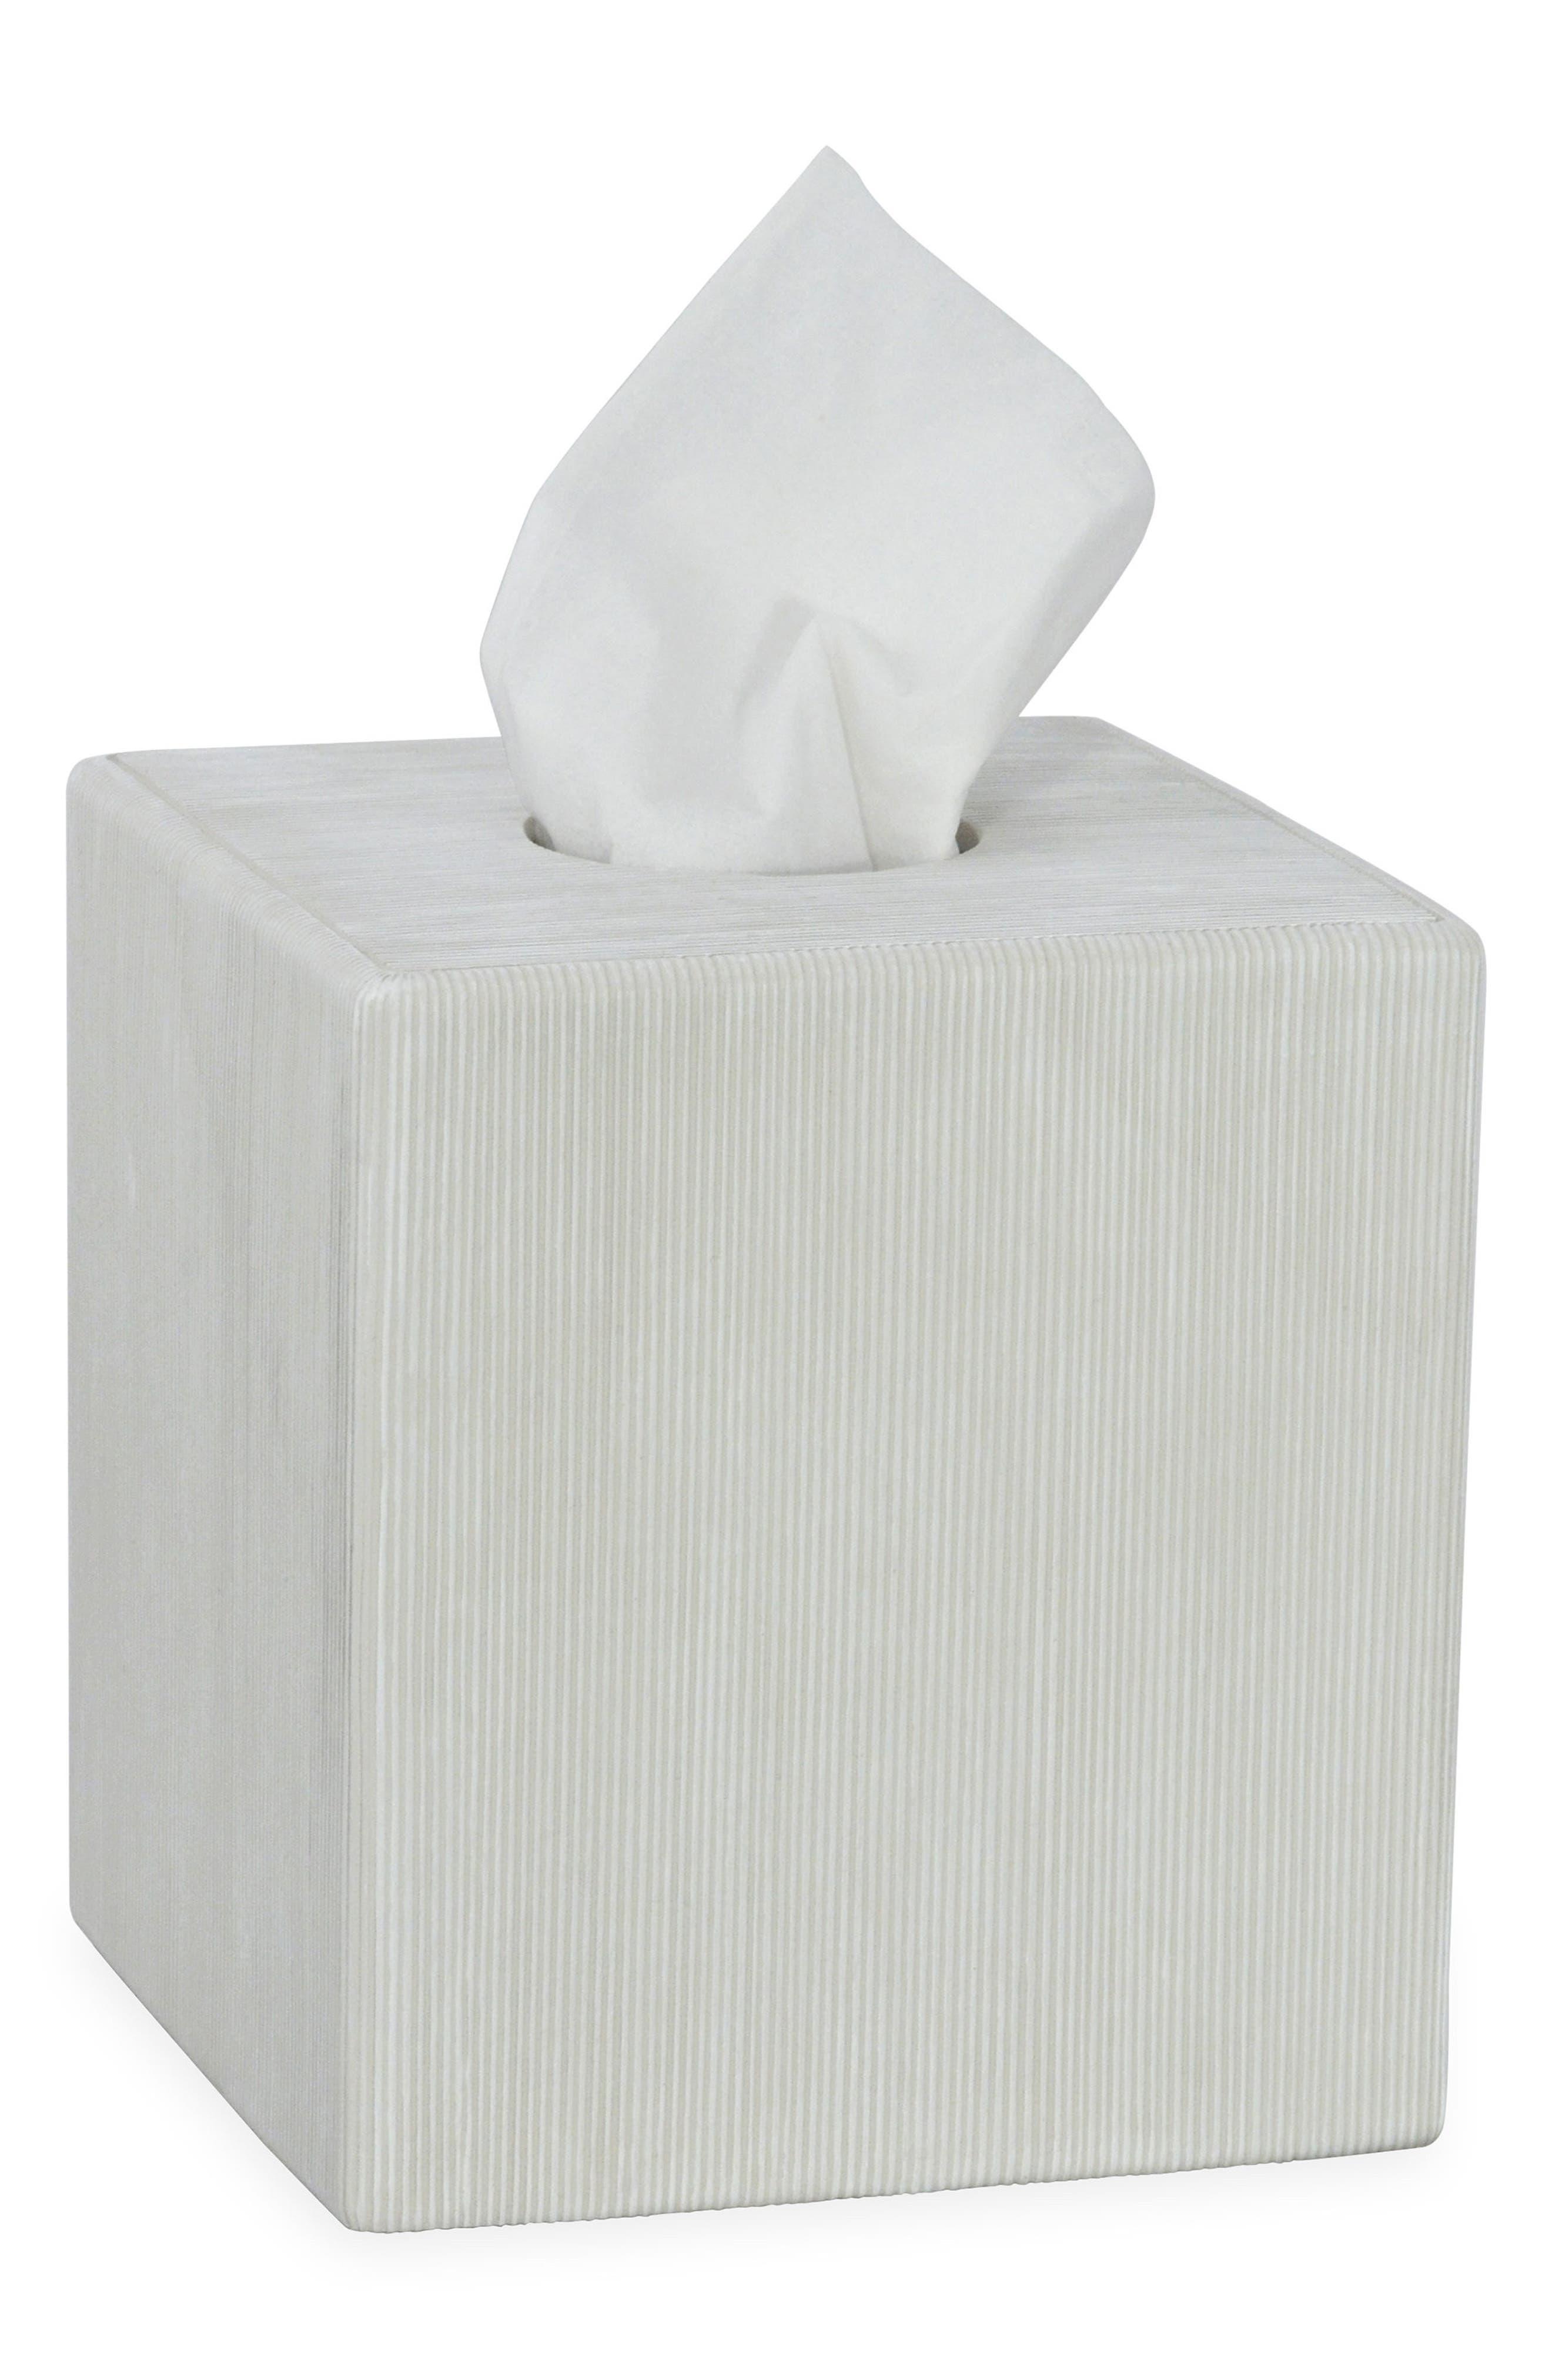 DKNY Fine Lines Ceramic Tissue Box Cover, Main, color, WHITE